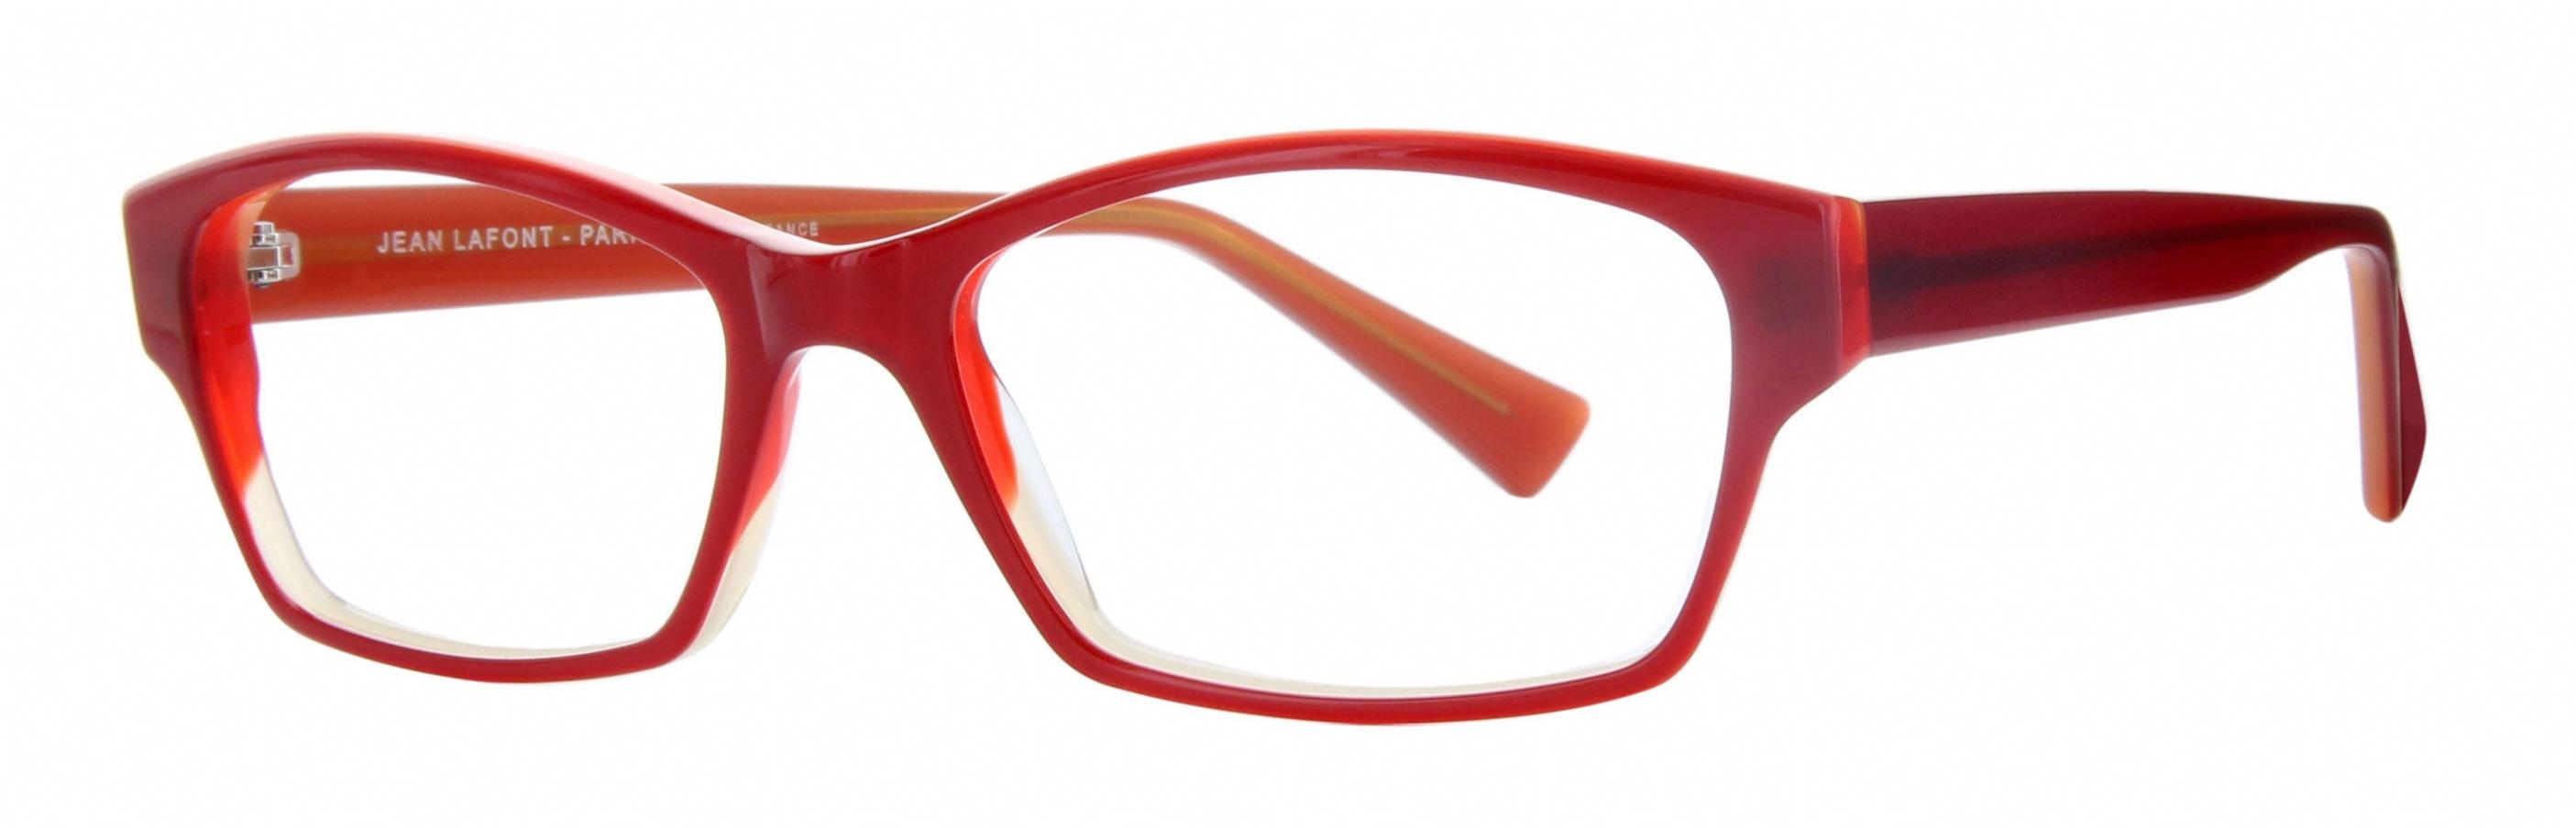 Jean lafont eyeglasses frames - Lafont Lin 6023